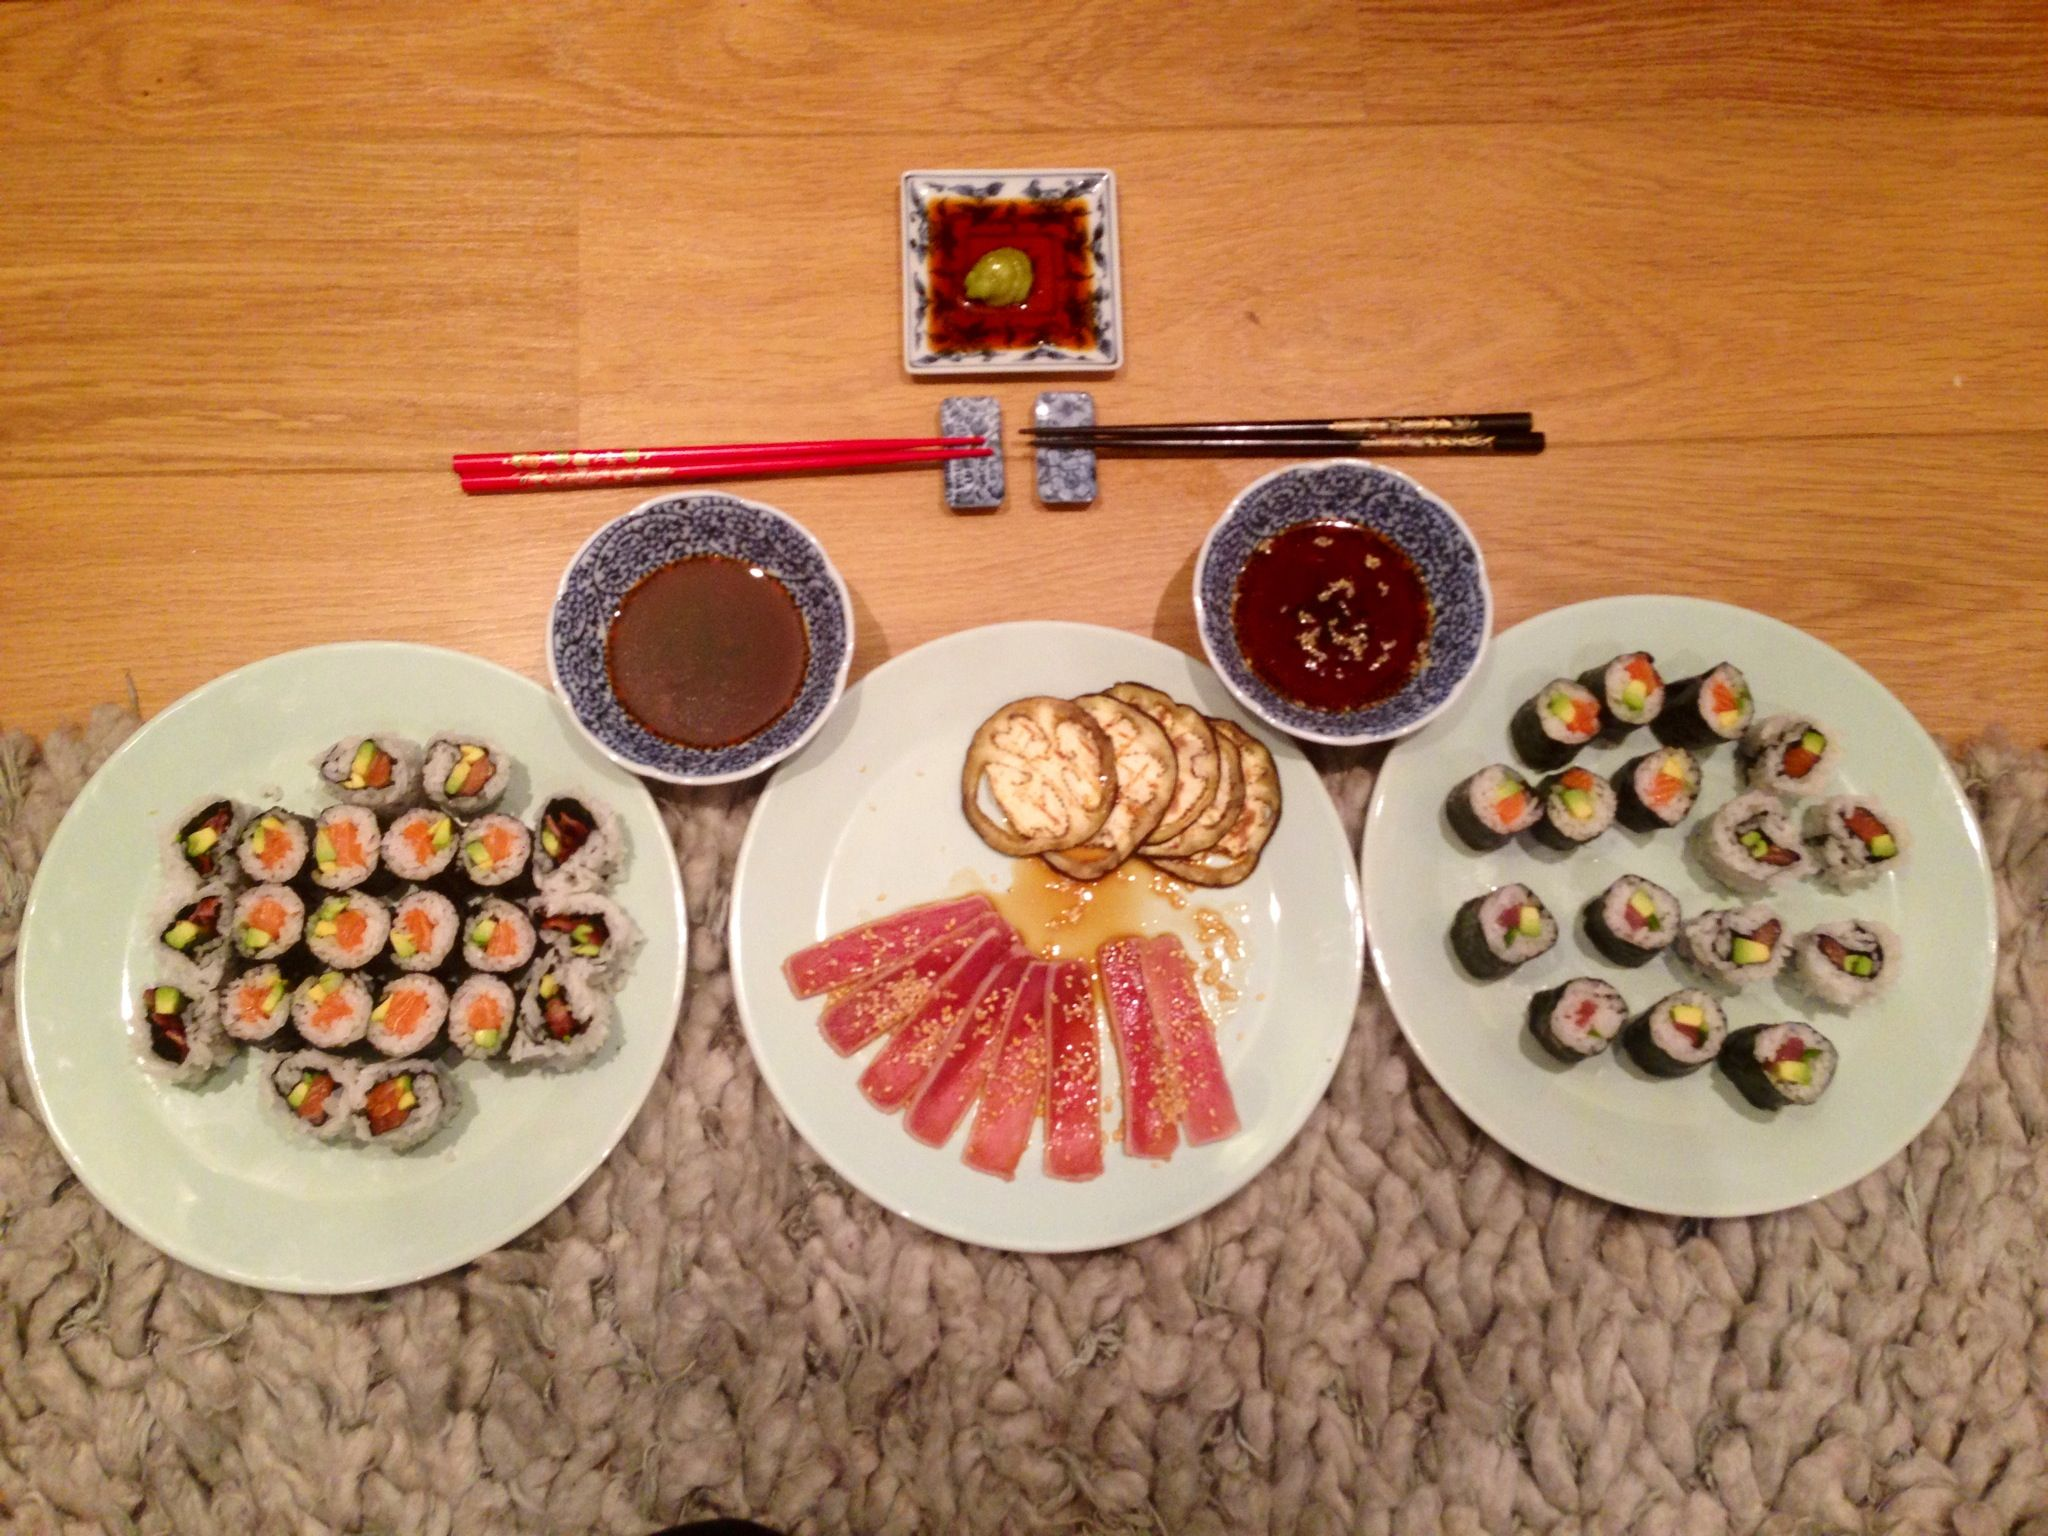 Seared Tuna with griddled Aubergine & Homemade Sushi - Salmon & Avocado Maki Sushi - Tuna & Avocado - Salmon & Avocado California rolls - Crispy Bacon & Avocado California rolls